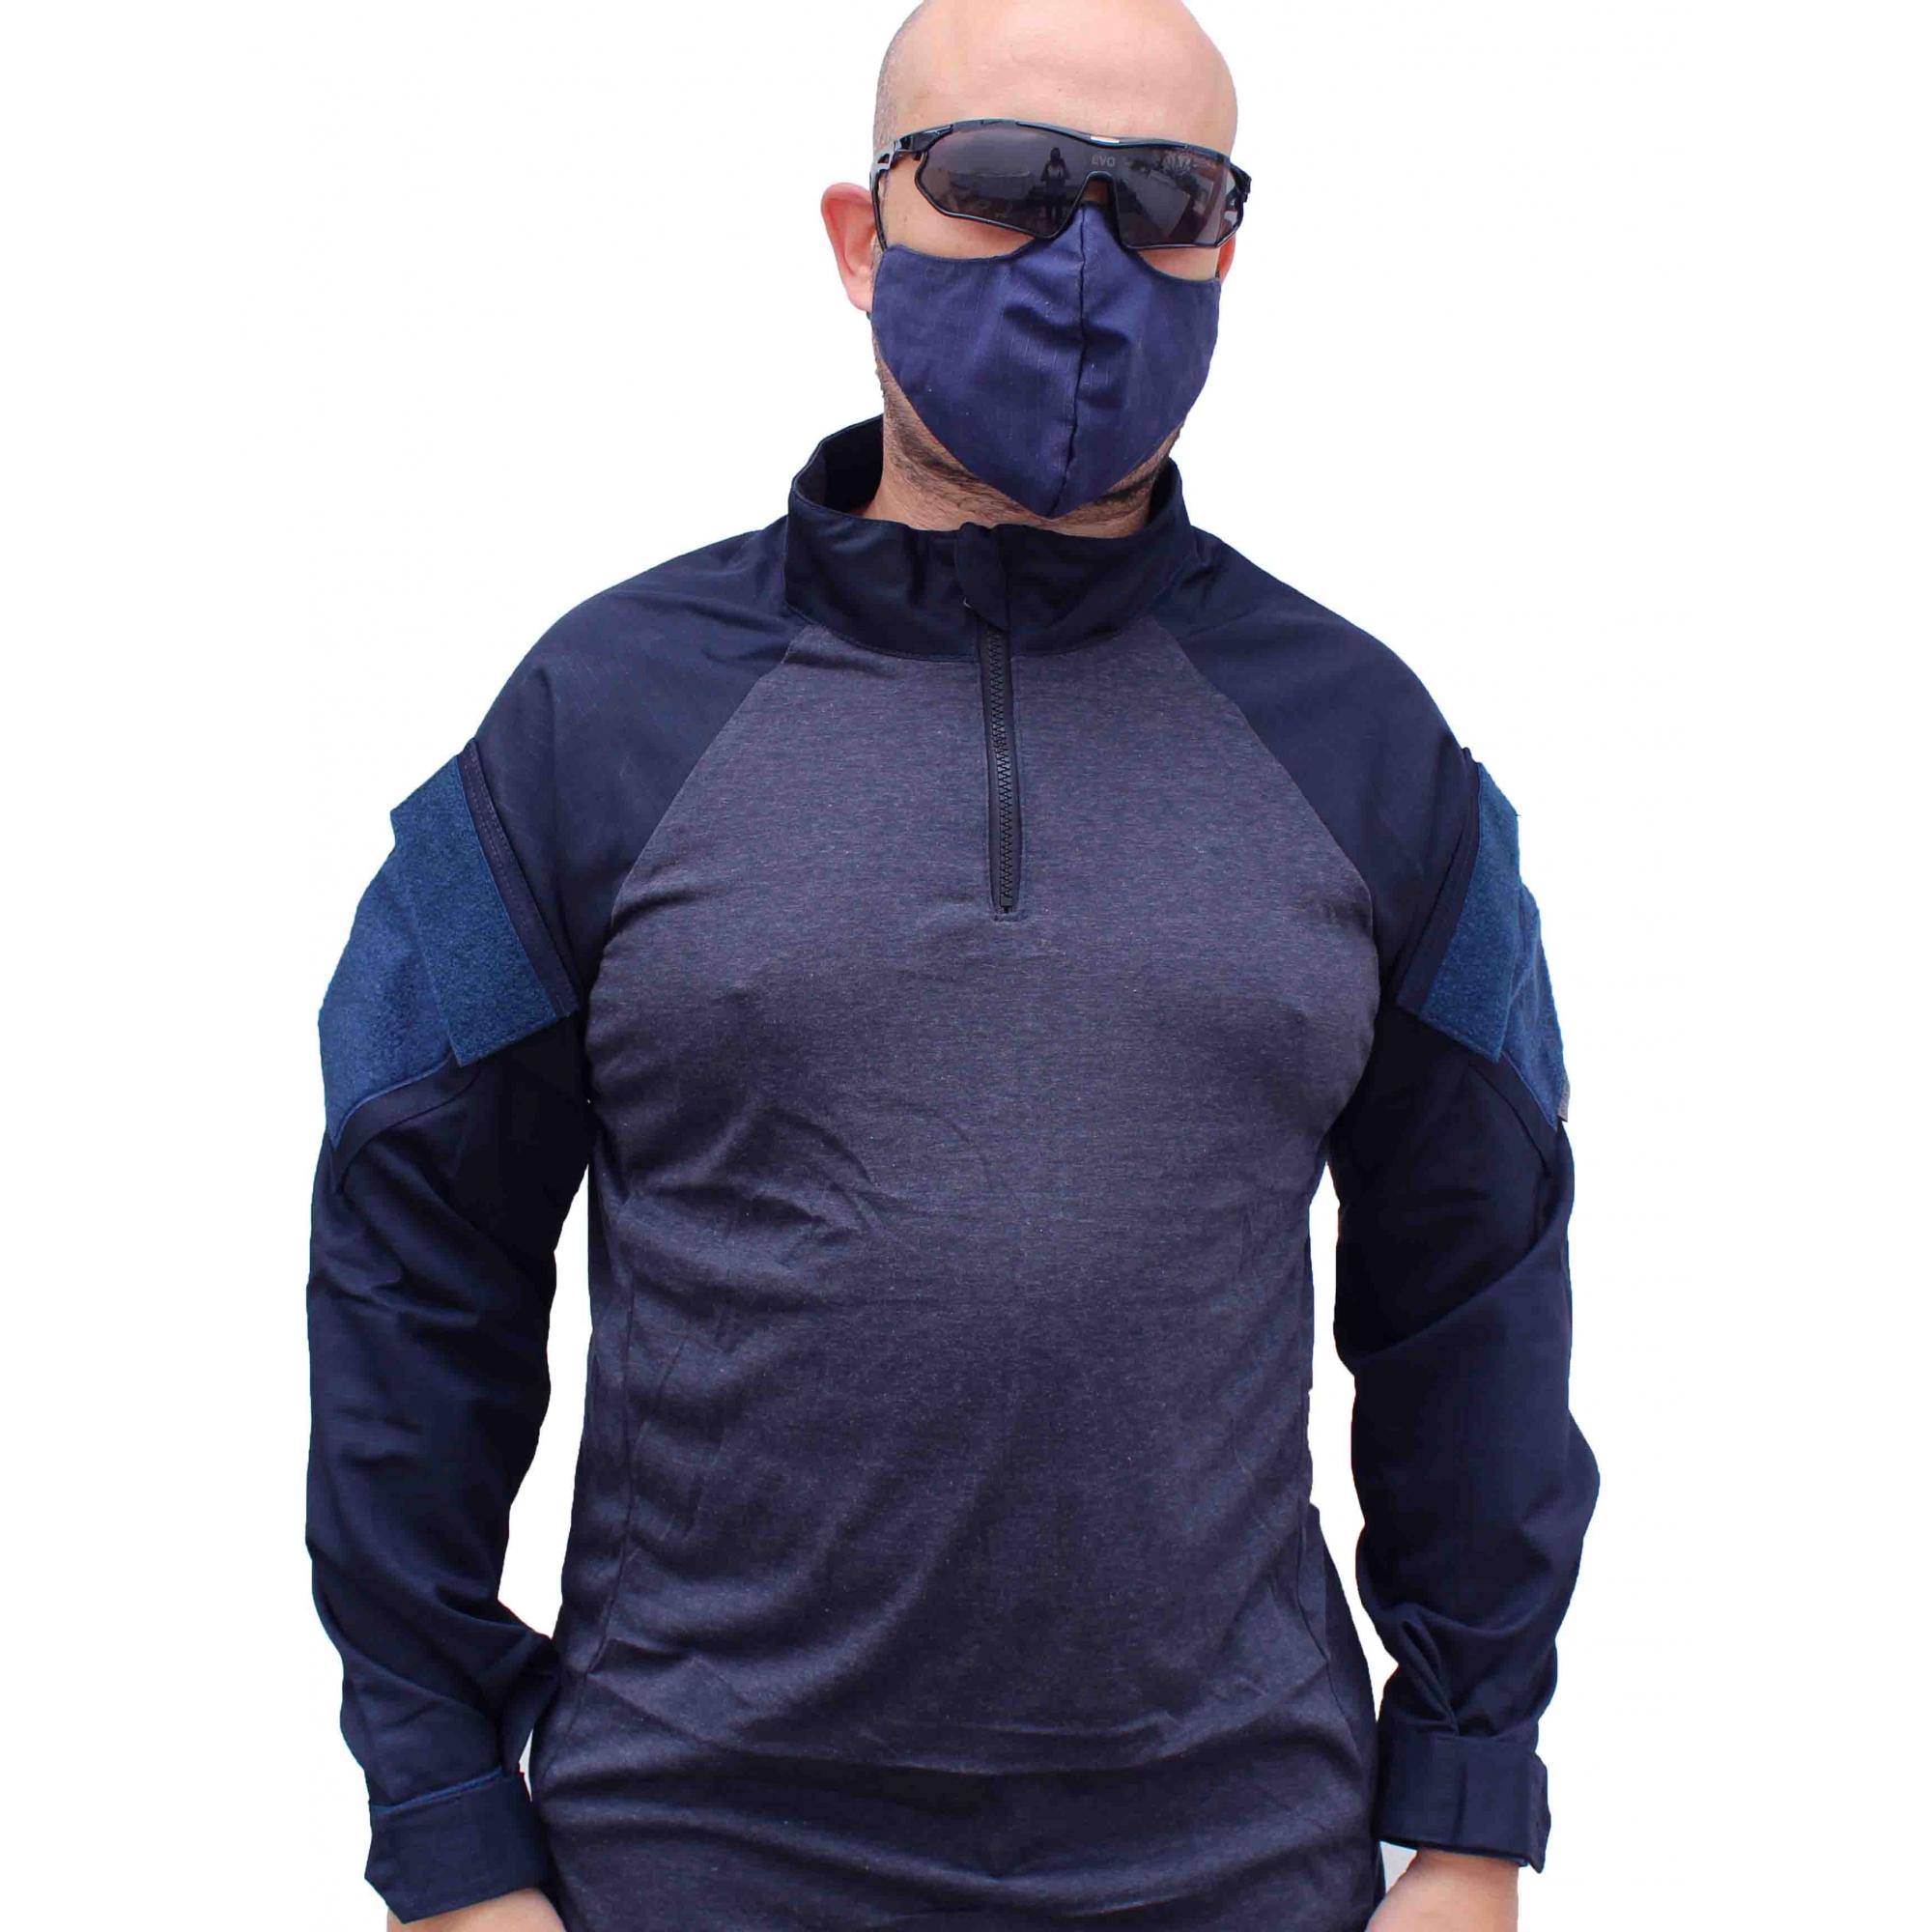 Combat Shirt 711 Forhonor Azul Marinho